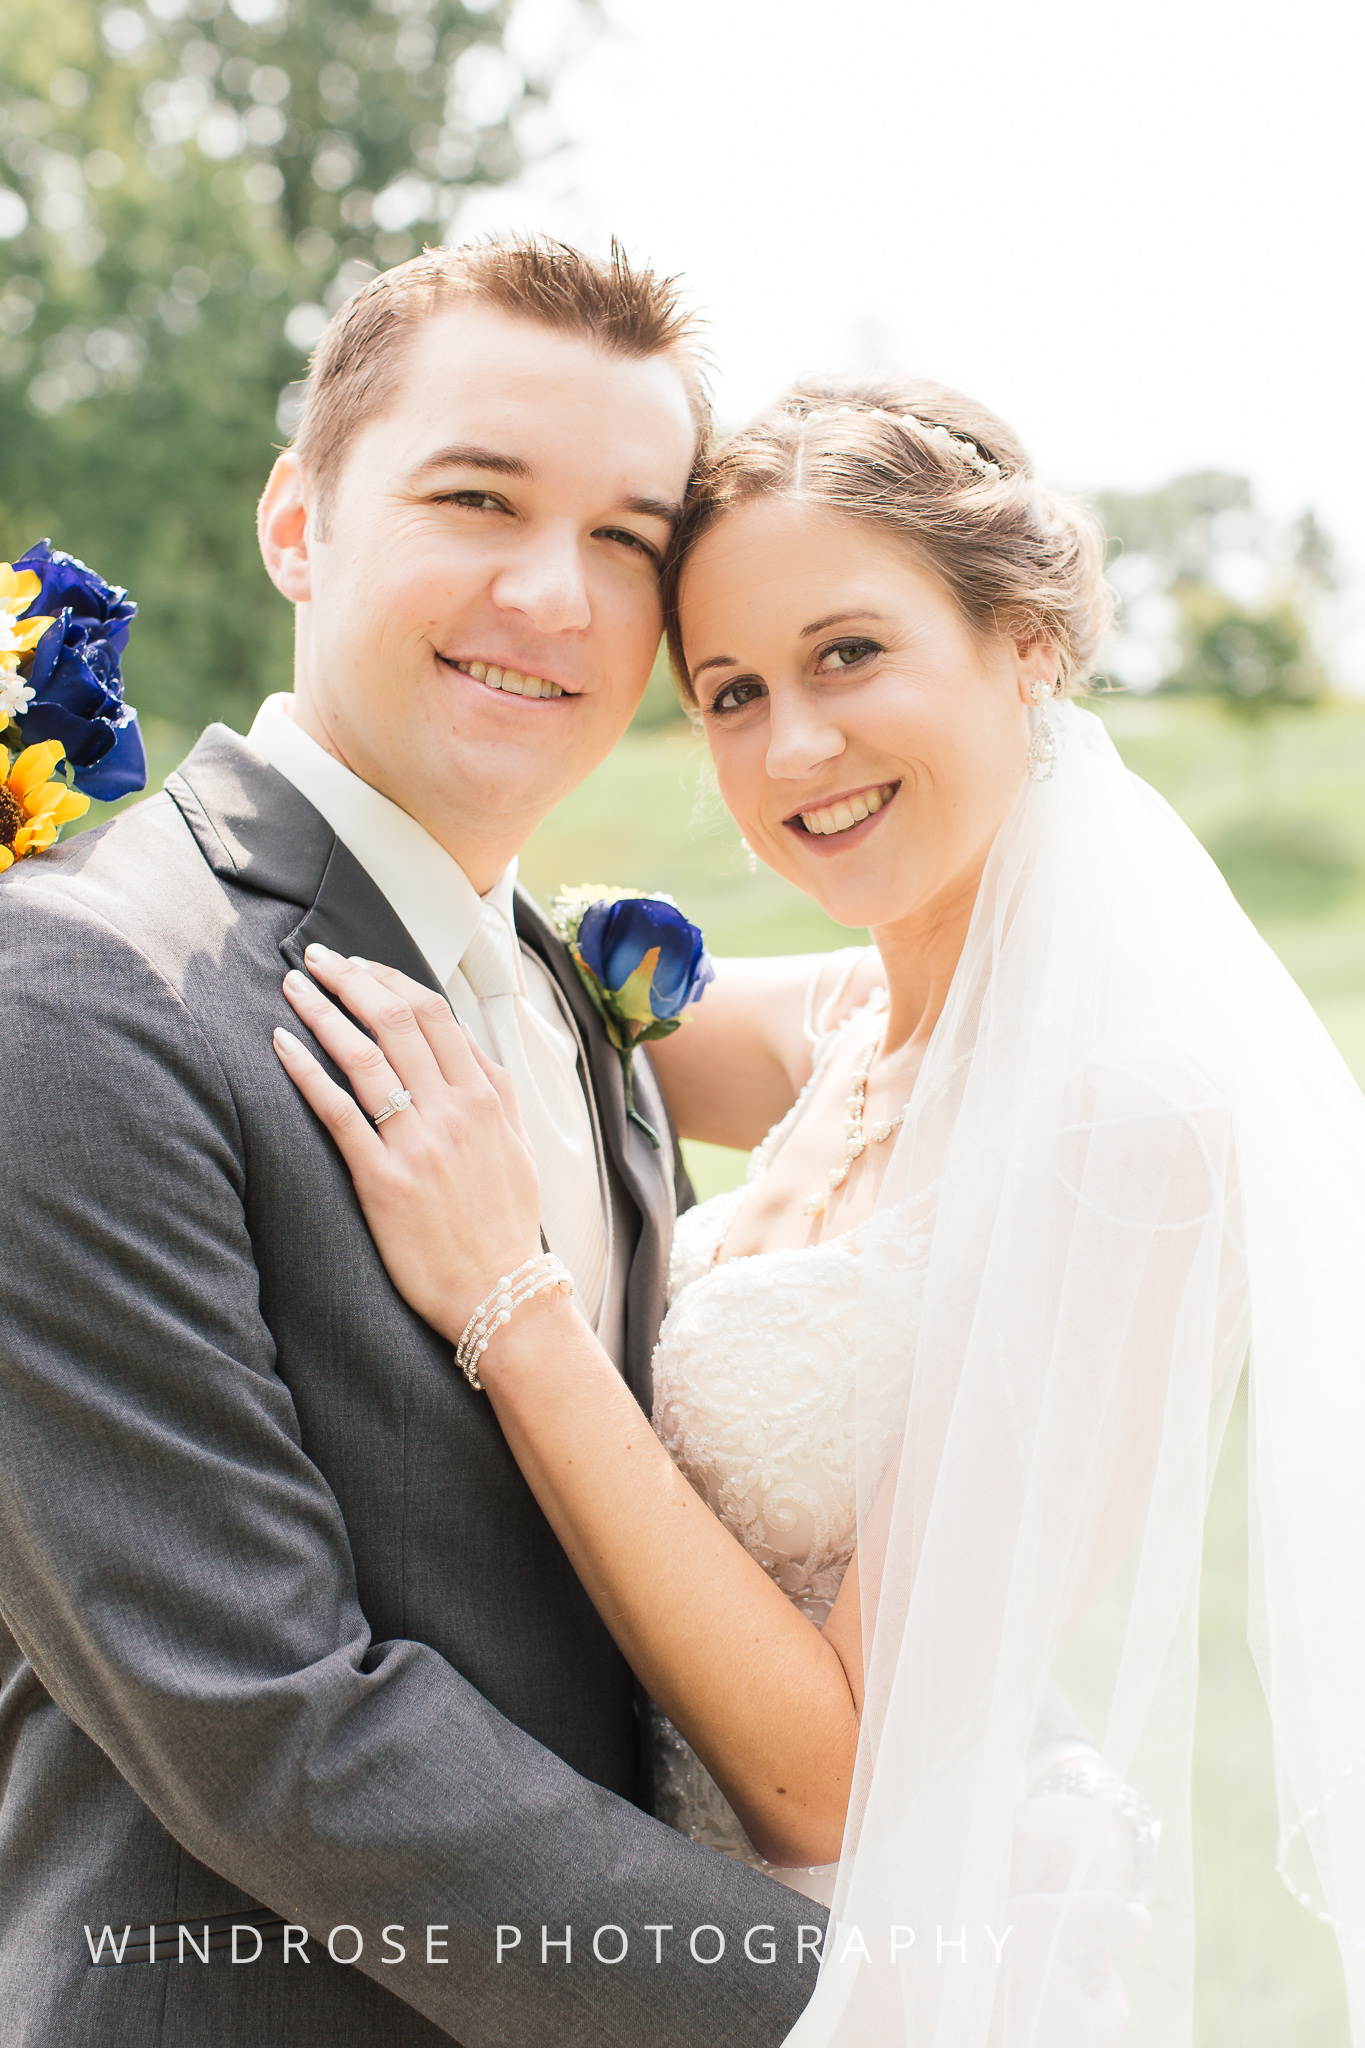 La-Crosse-Country-Club-Wedding-Minnesota-Wedding-Photographer-6.jpg